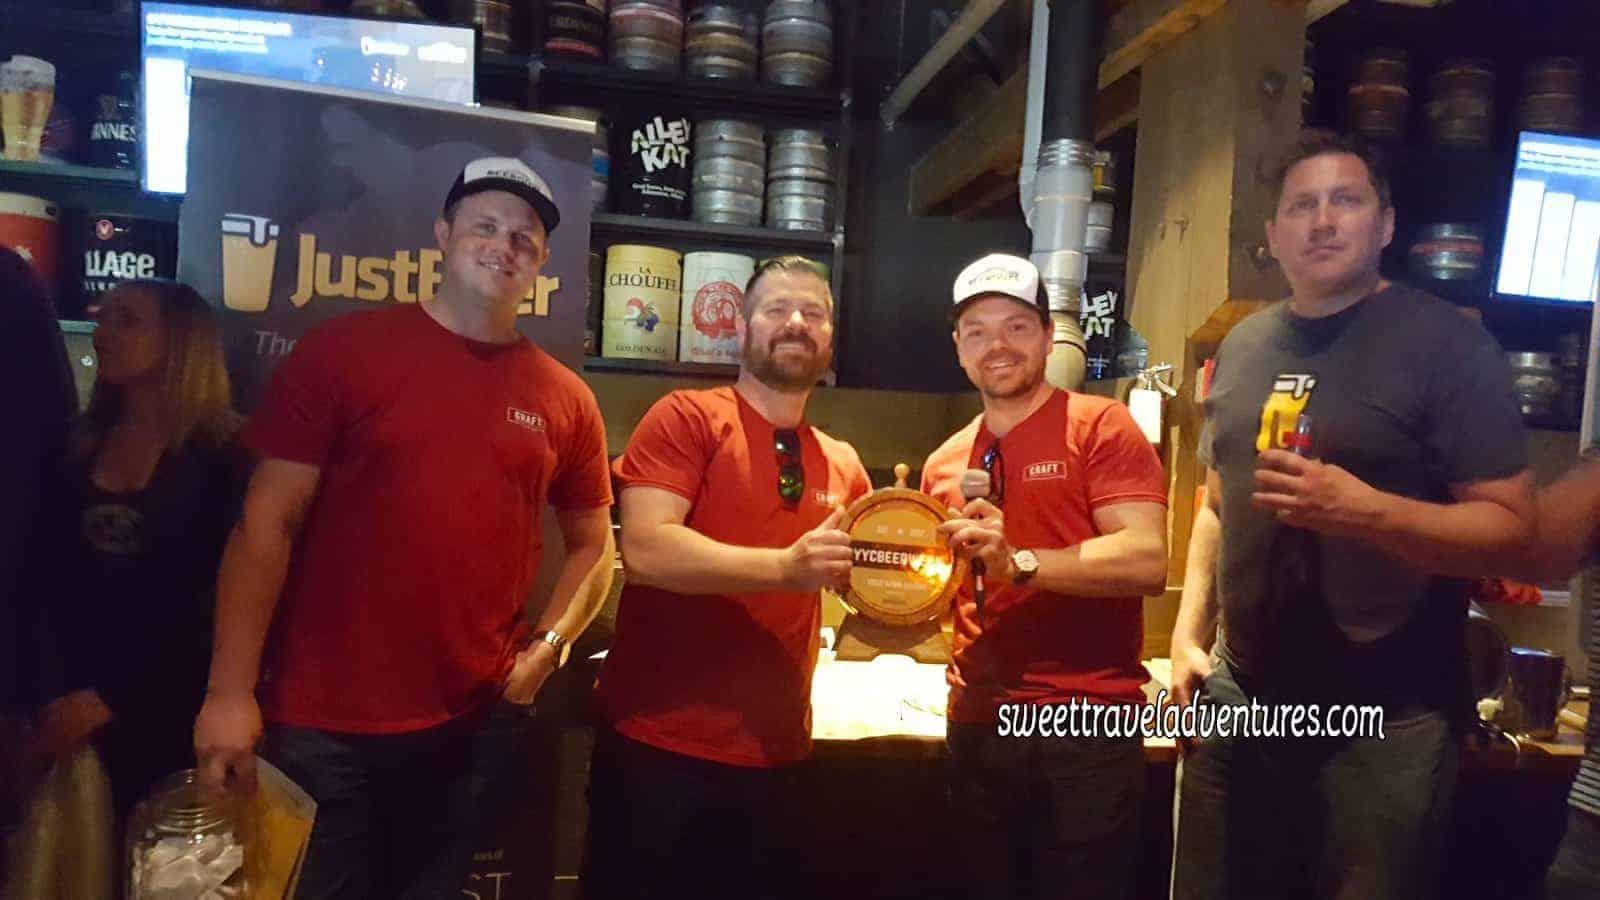 Wild-rose-brewery-winner.jpg